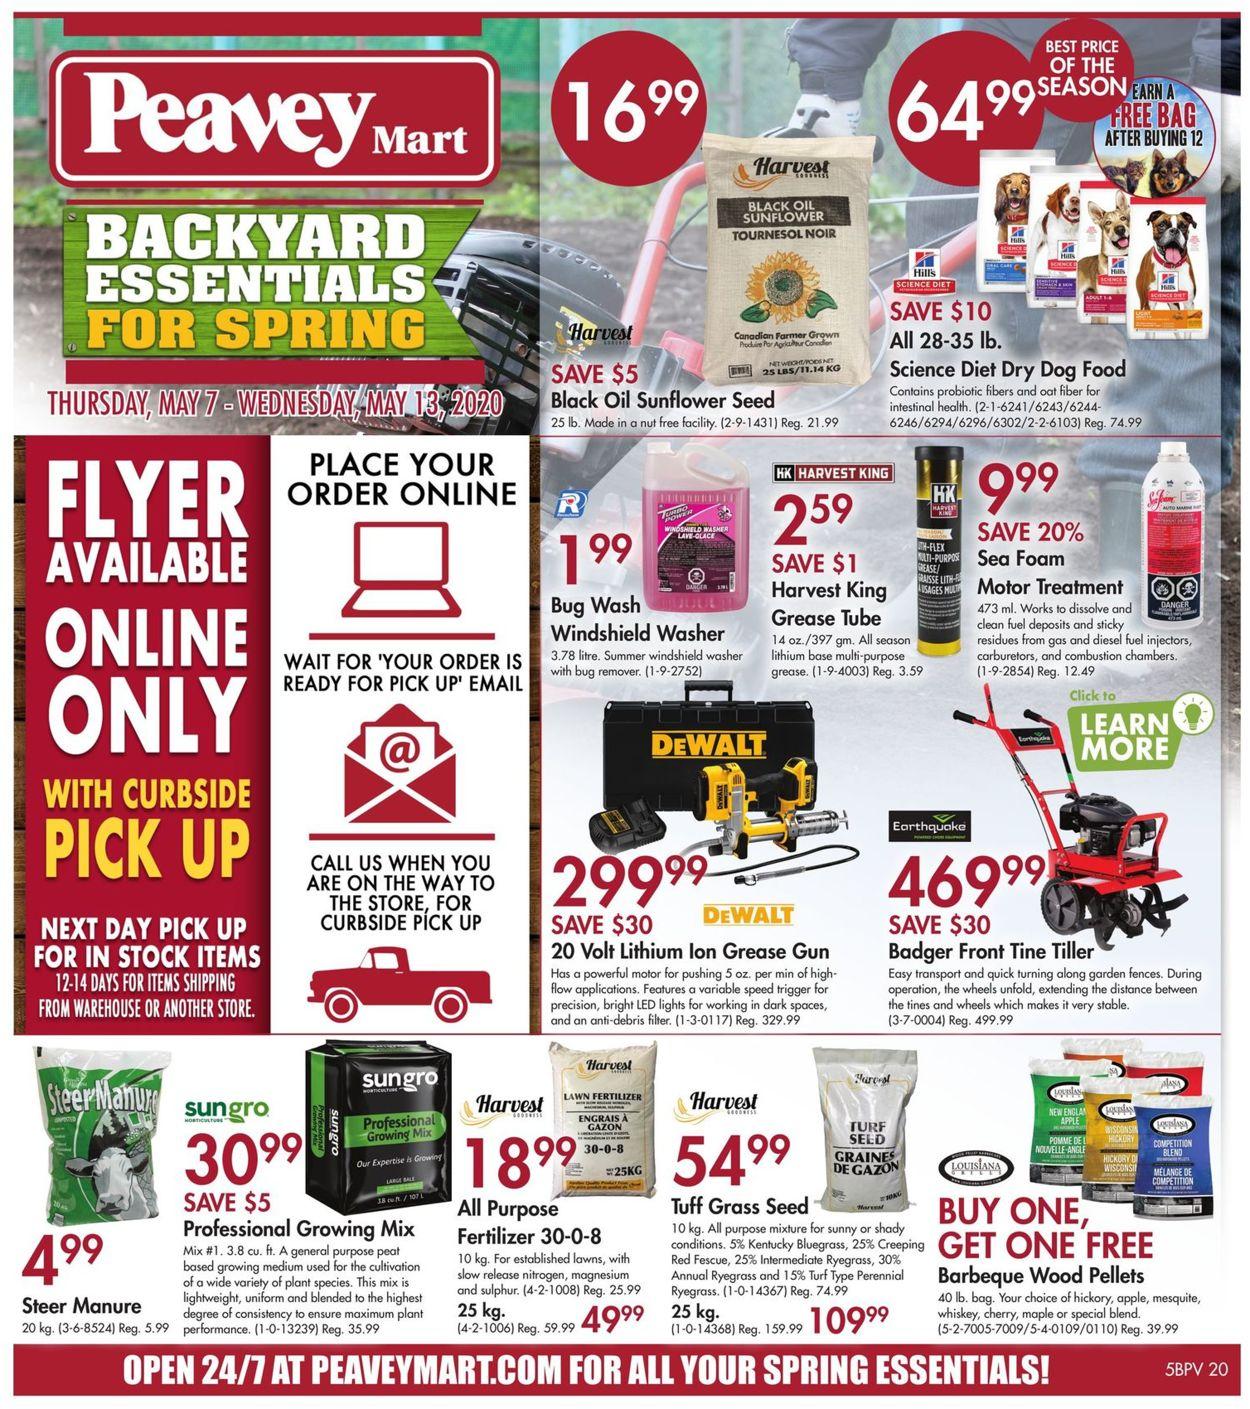 Peavey Mart Flyer - 05/07-05/13/2020